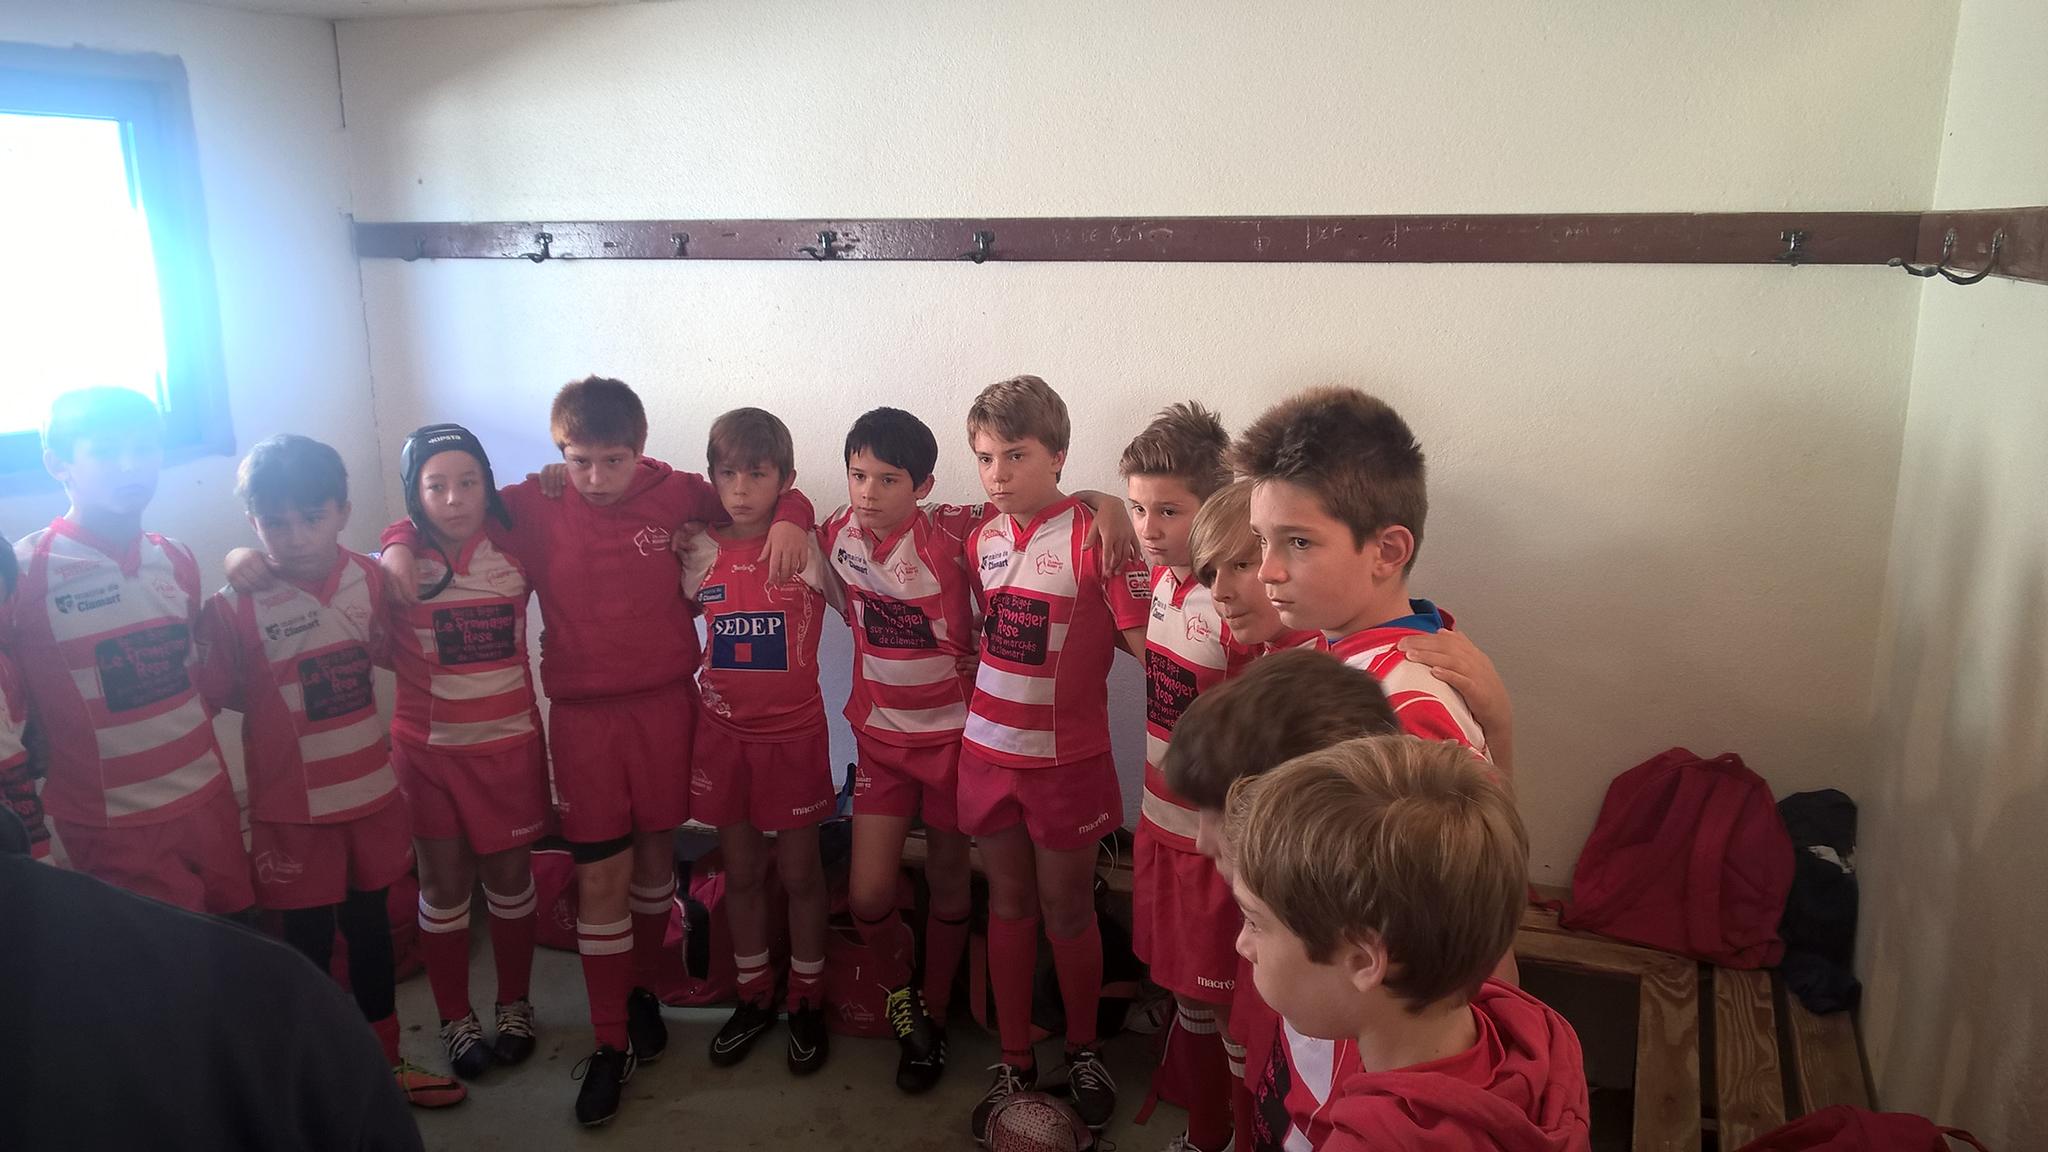 Clamart Rugby 92 Triangulaire U12 de Marne La Coquette samedi 30 septembre 2017